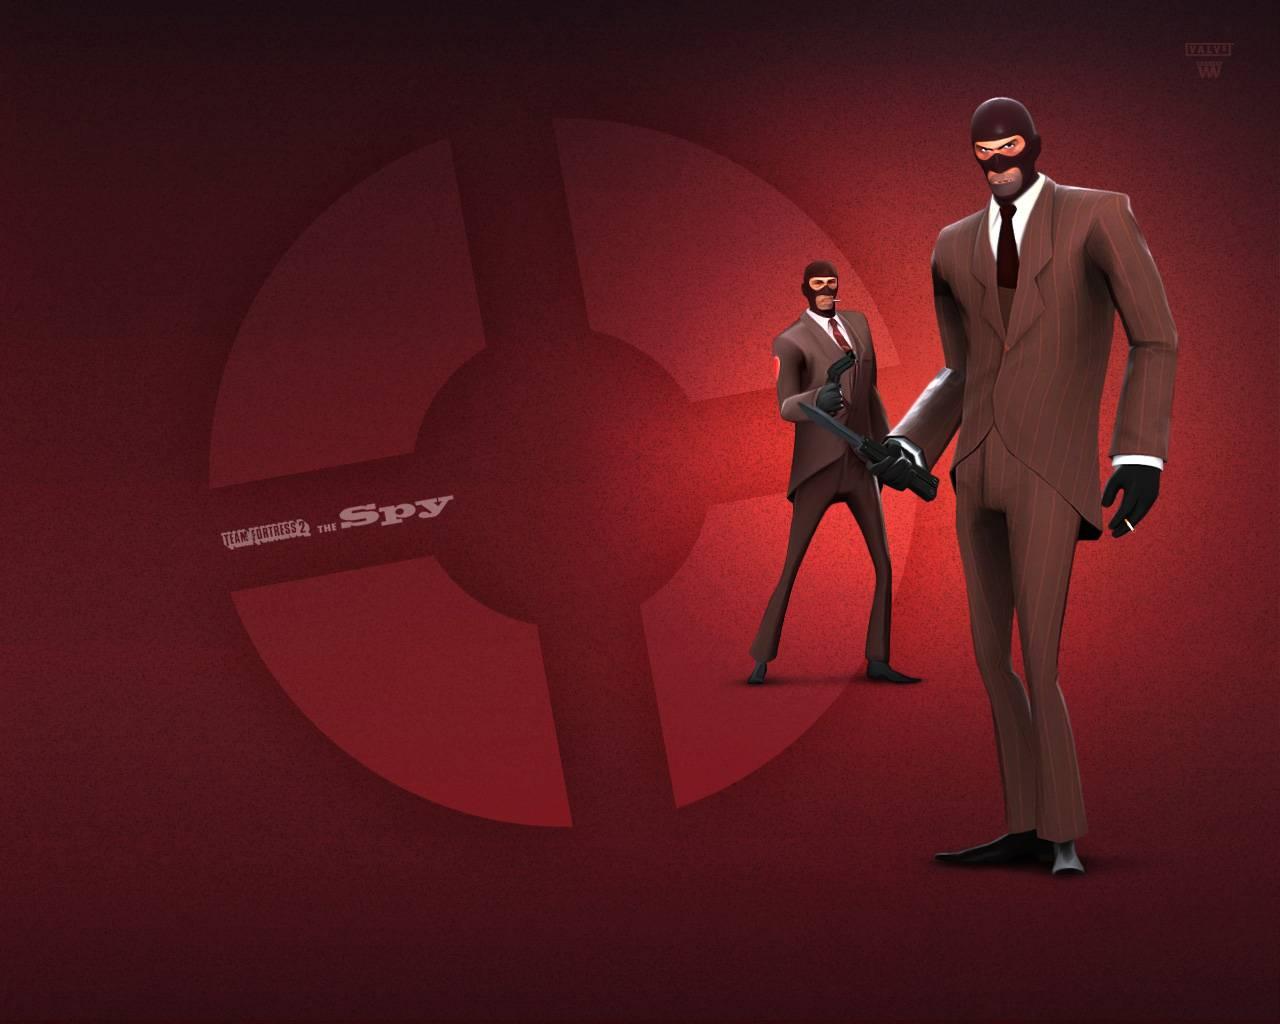 Team Fortress 2 Red Spy   Team Fortress Wallpaper 1280x1024